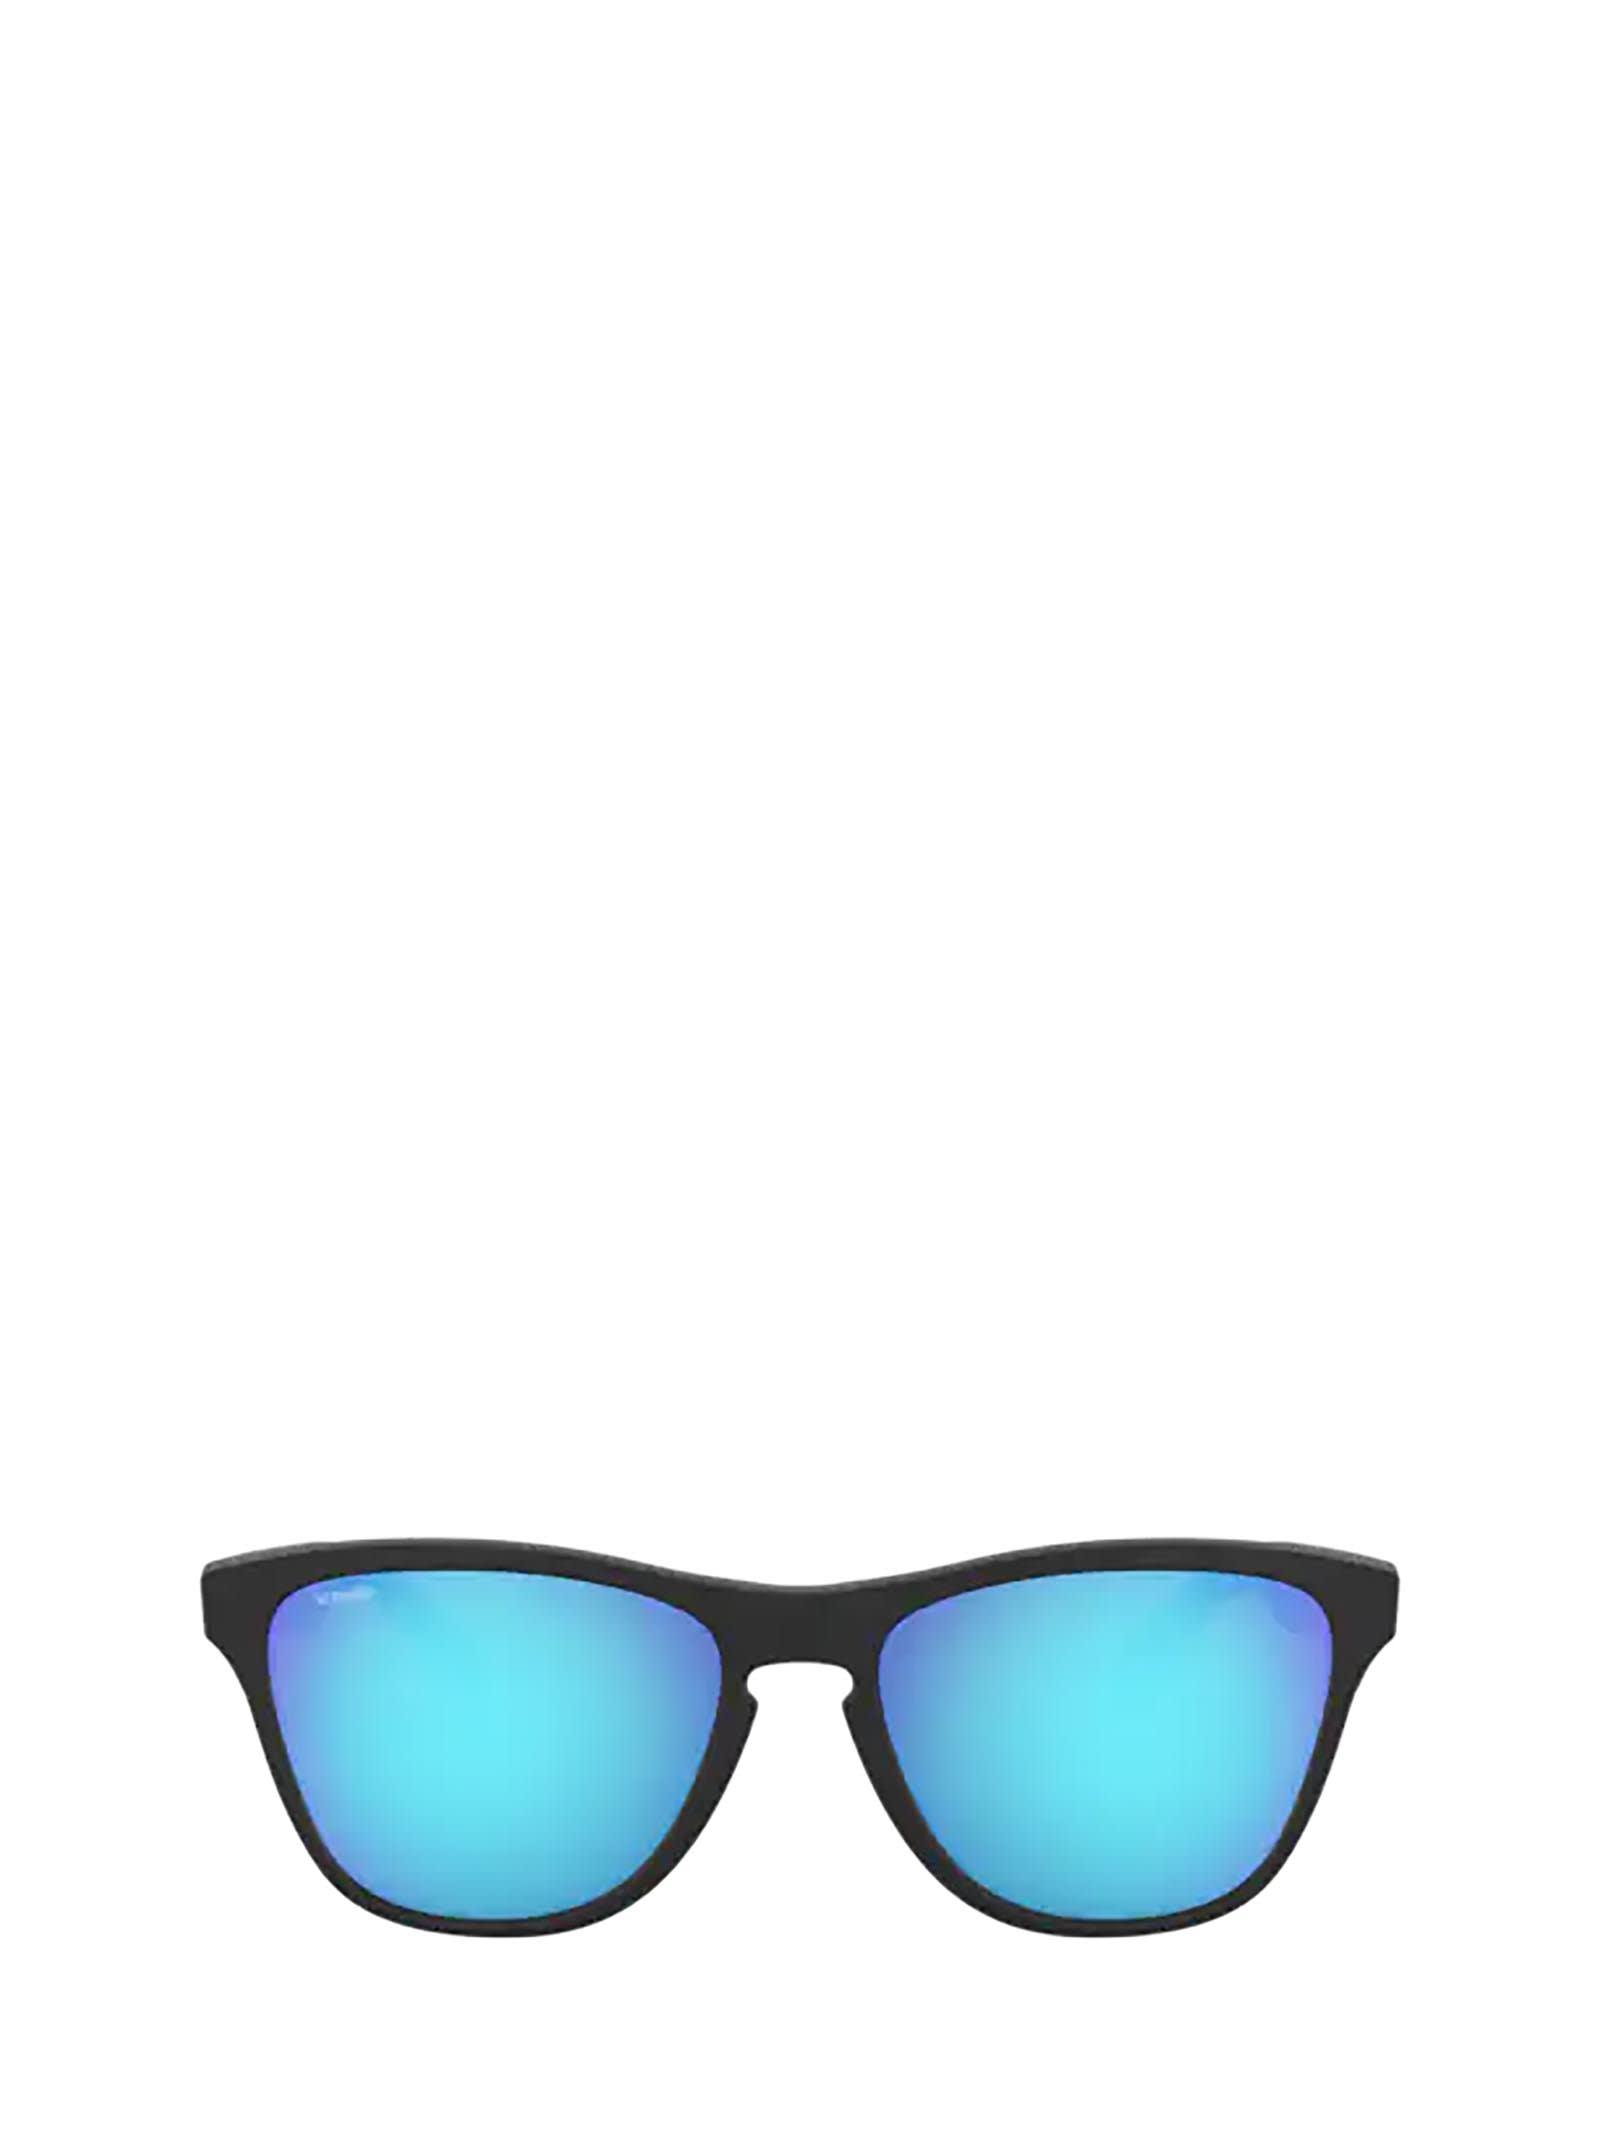 Oakley Oj9006 Polished Black Sunglasses